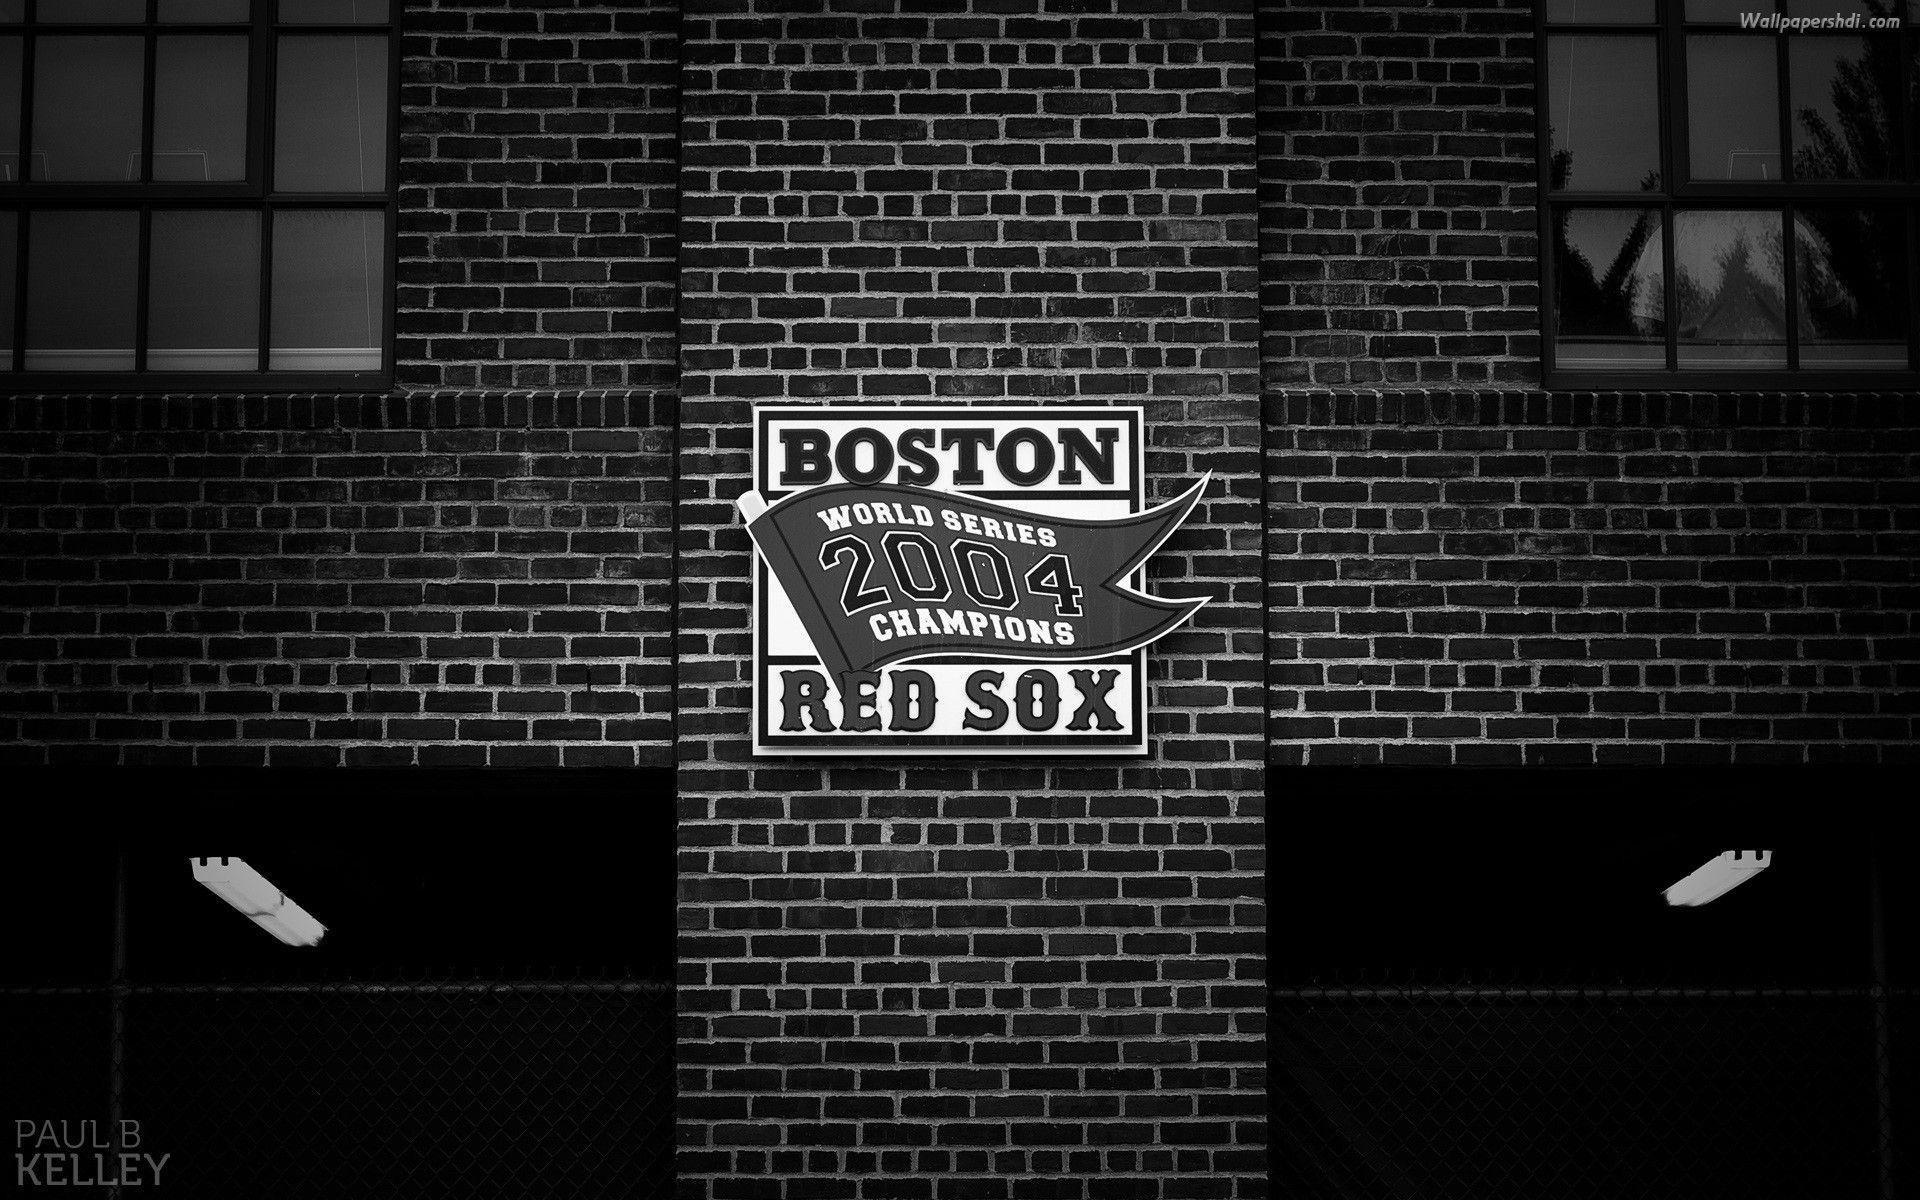 MLB Wallpapers: Boston Red Sox – 2007 World Series Champions